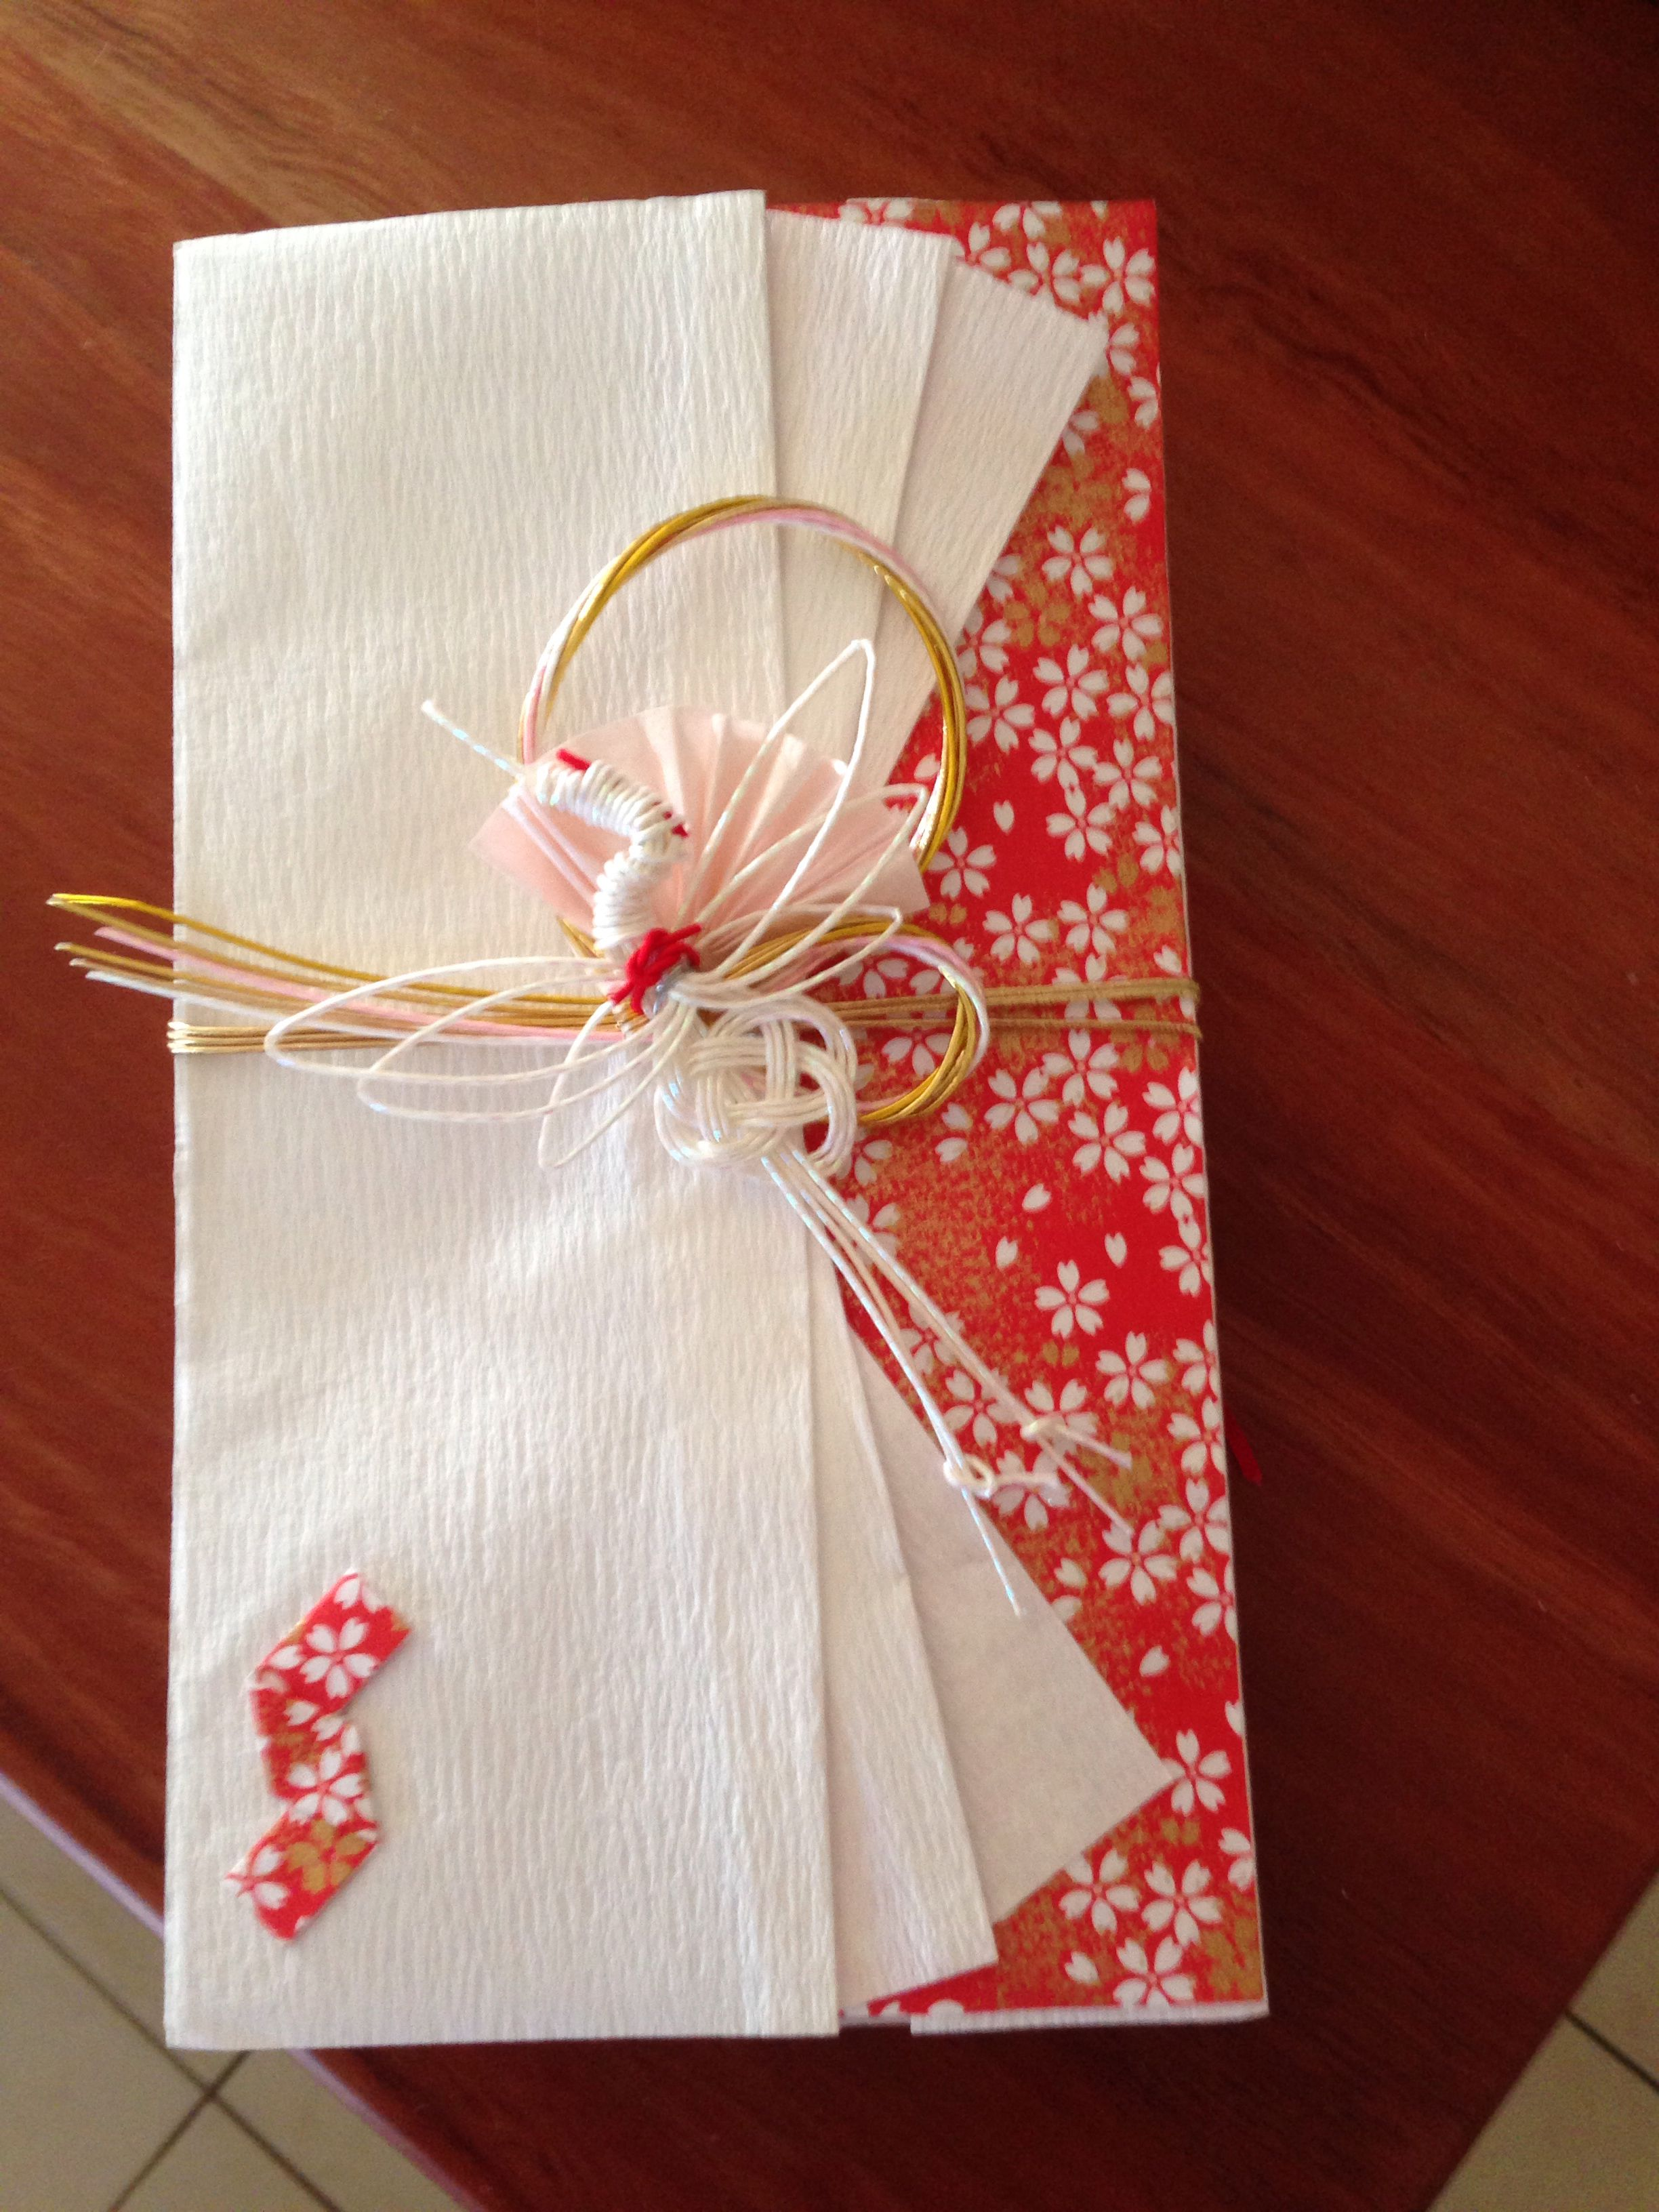 Wedding Gift Cash Envelope : ... money envelope. Hand Made Pinterest Wedding, Money envelopes and